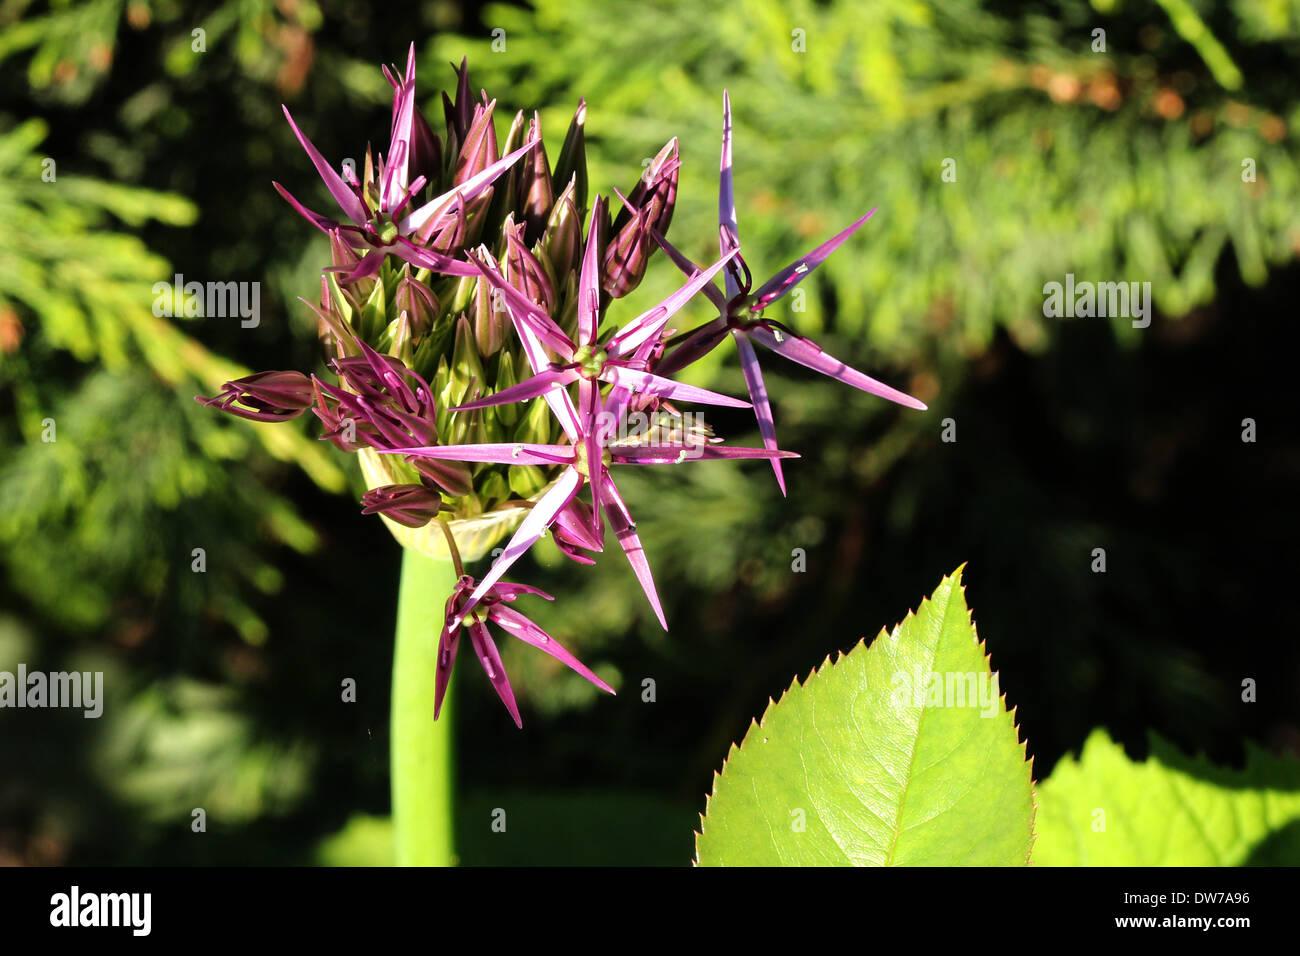 Purple Alium flower emerging against a conifer hedge - Stock Image